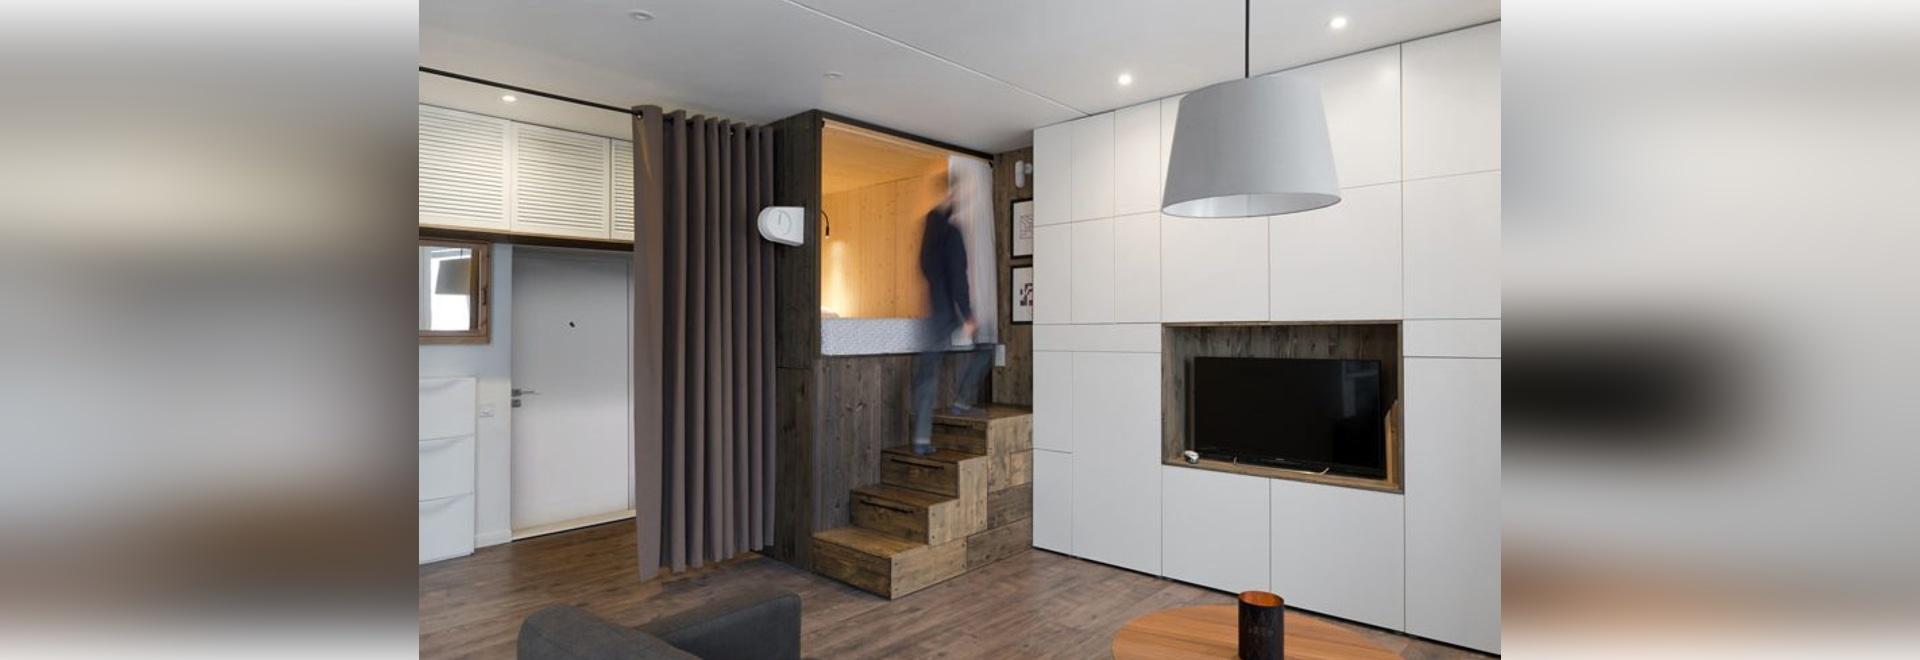 Small Apartment Design Idea – Raised bedroom allows for ...